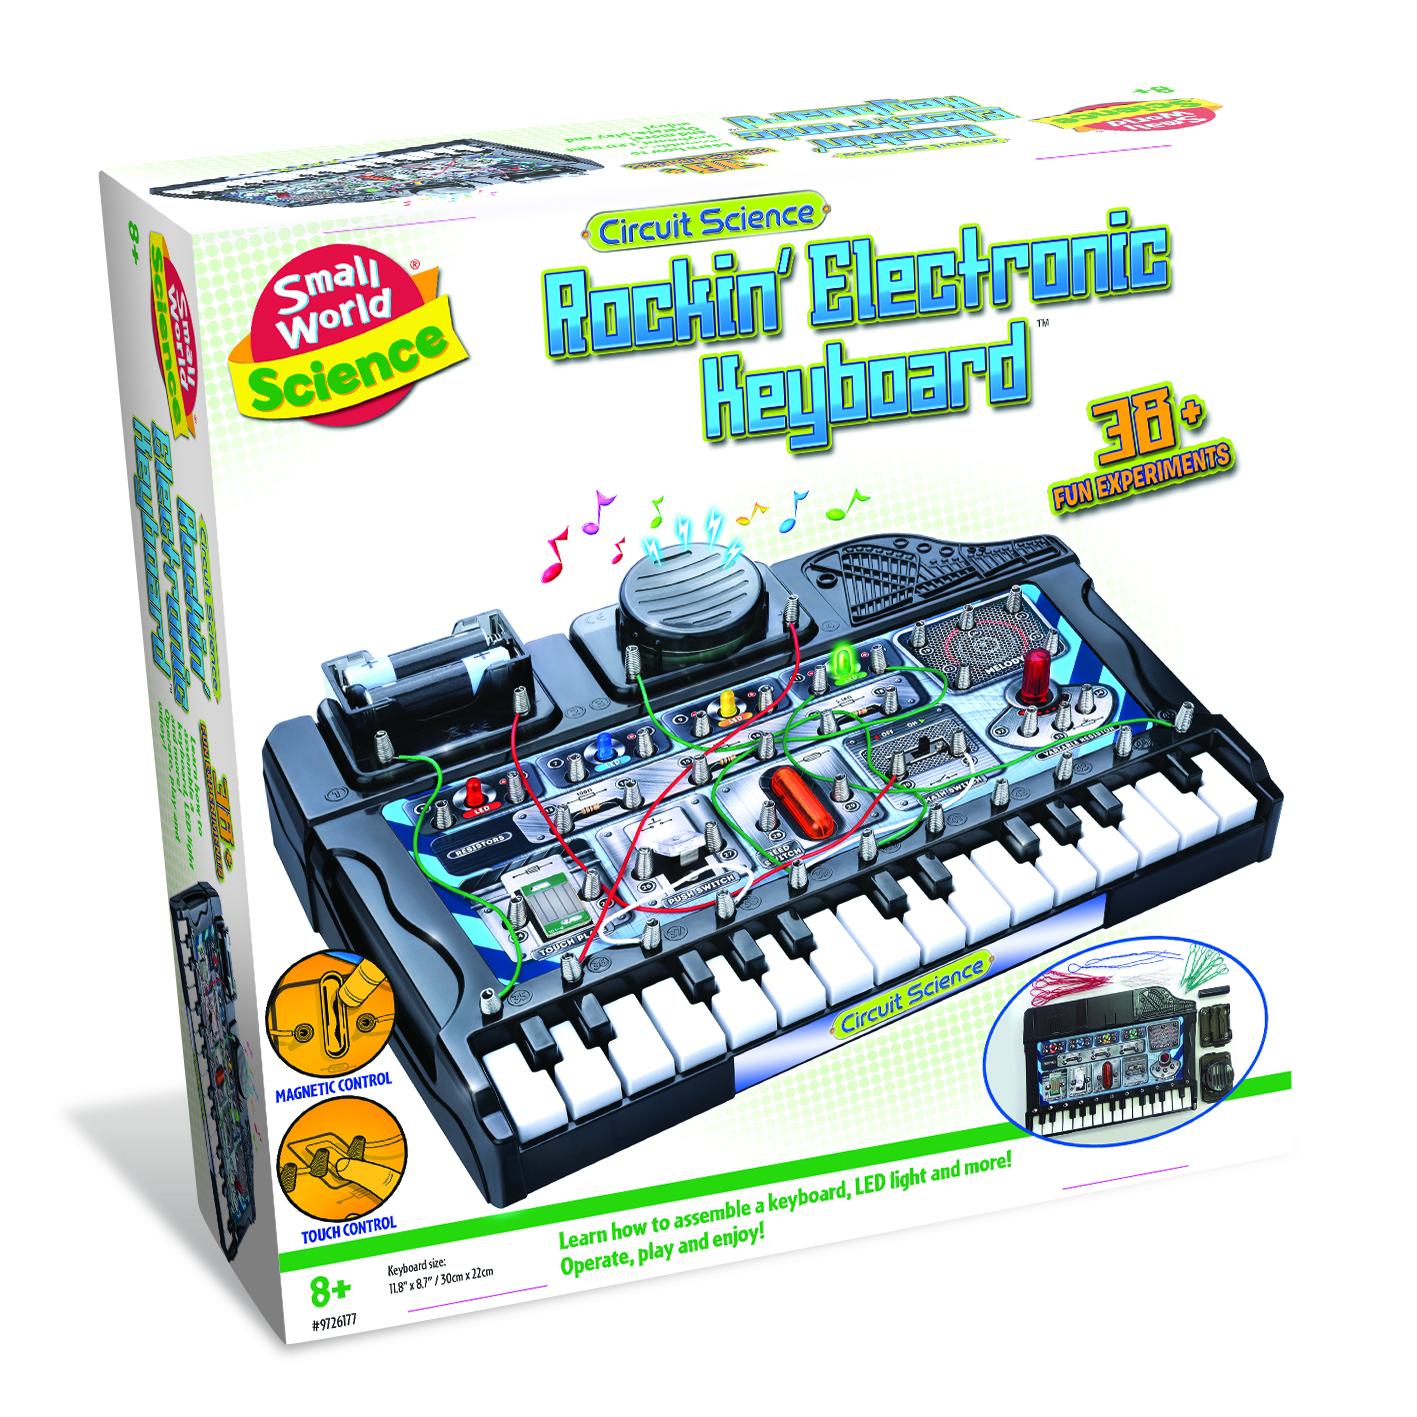 Circuit Science Rockin Electronic Keyboard Ebay Elenco Snap Circuits Green Alternative Energy From